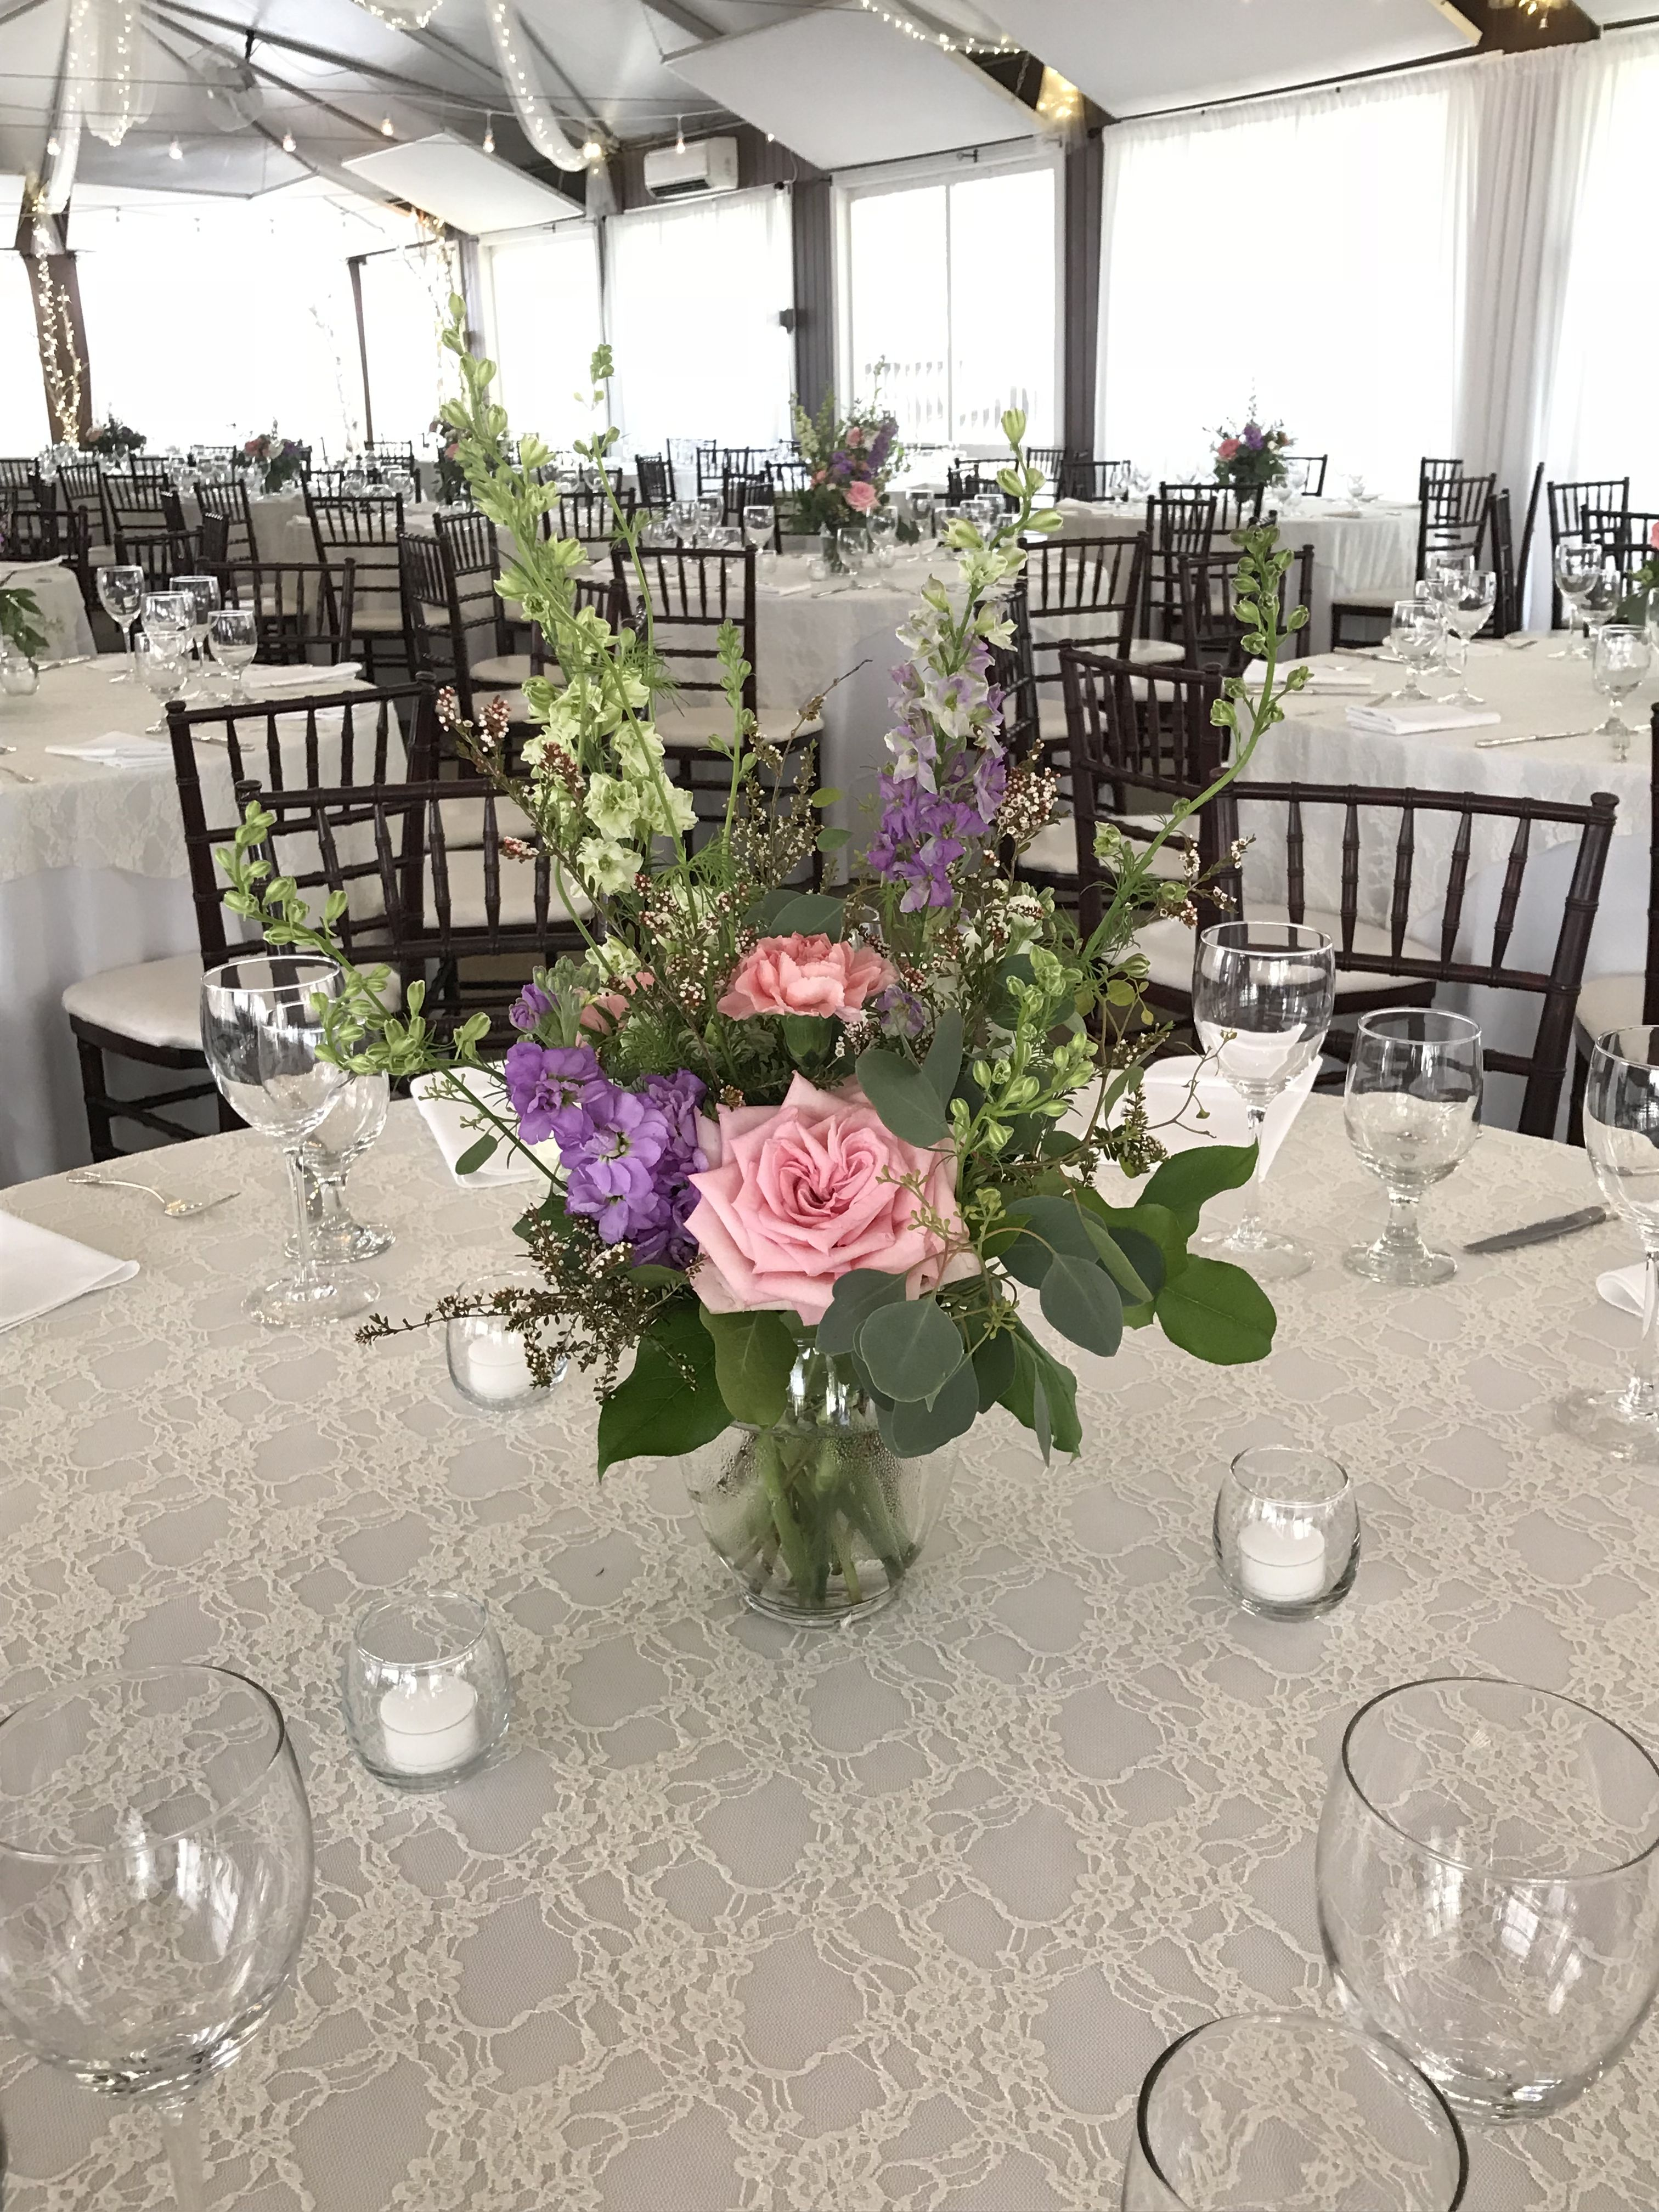 Tuesday and Cody Destination wedding venues, Reception